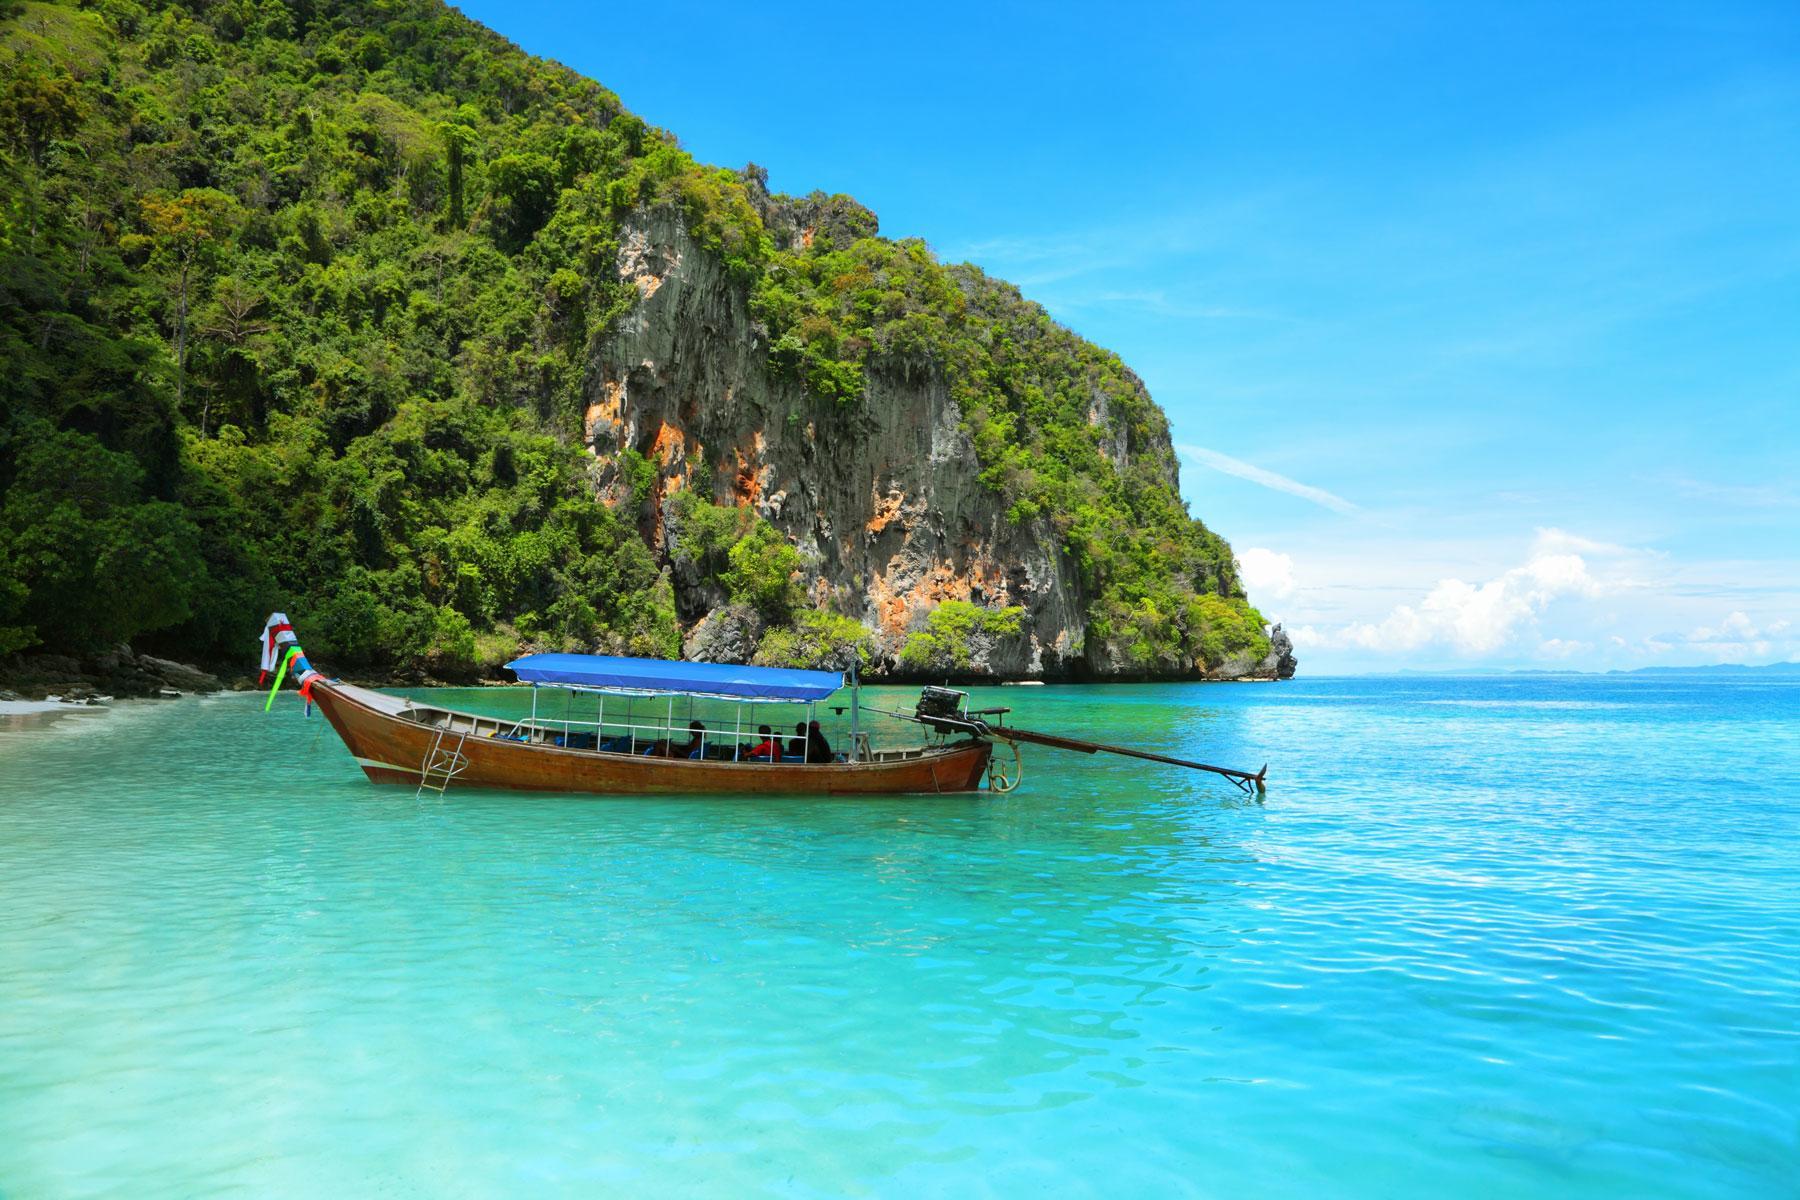 09_Thailand_Snorkeling_Diving_Koh_Phi_PhiShutterstock_41568352